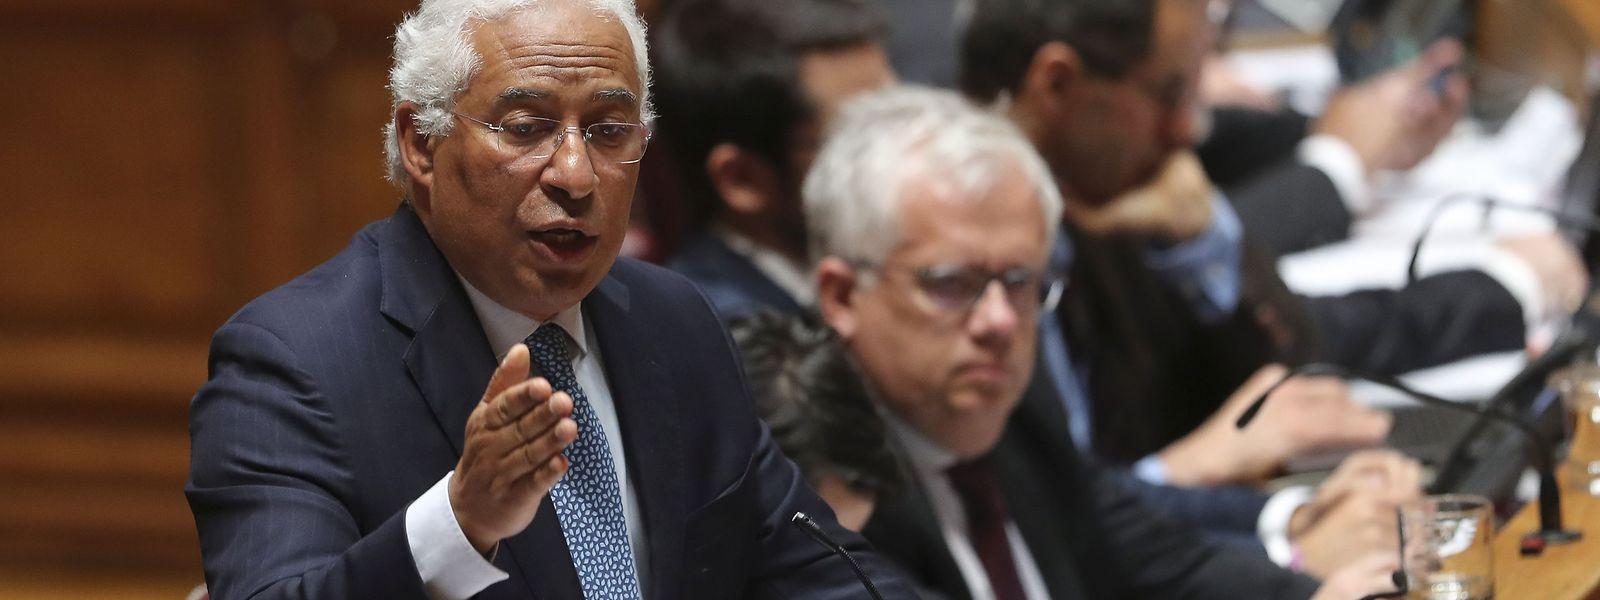 O primeiro-ministro, António Costa, durante o debate quinzenal na Assembleia da República.